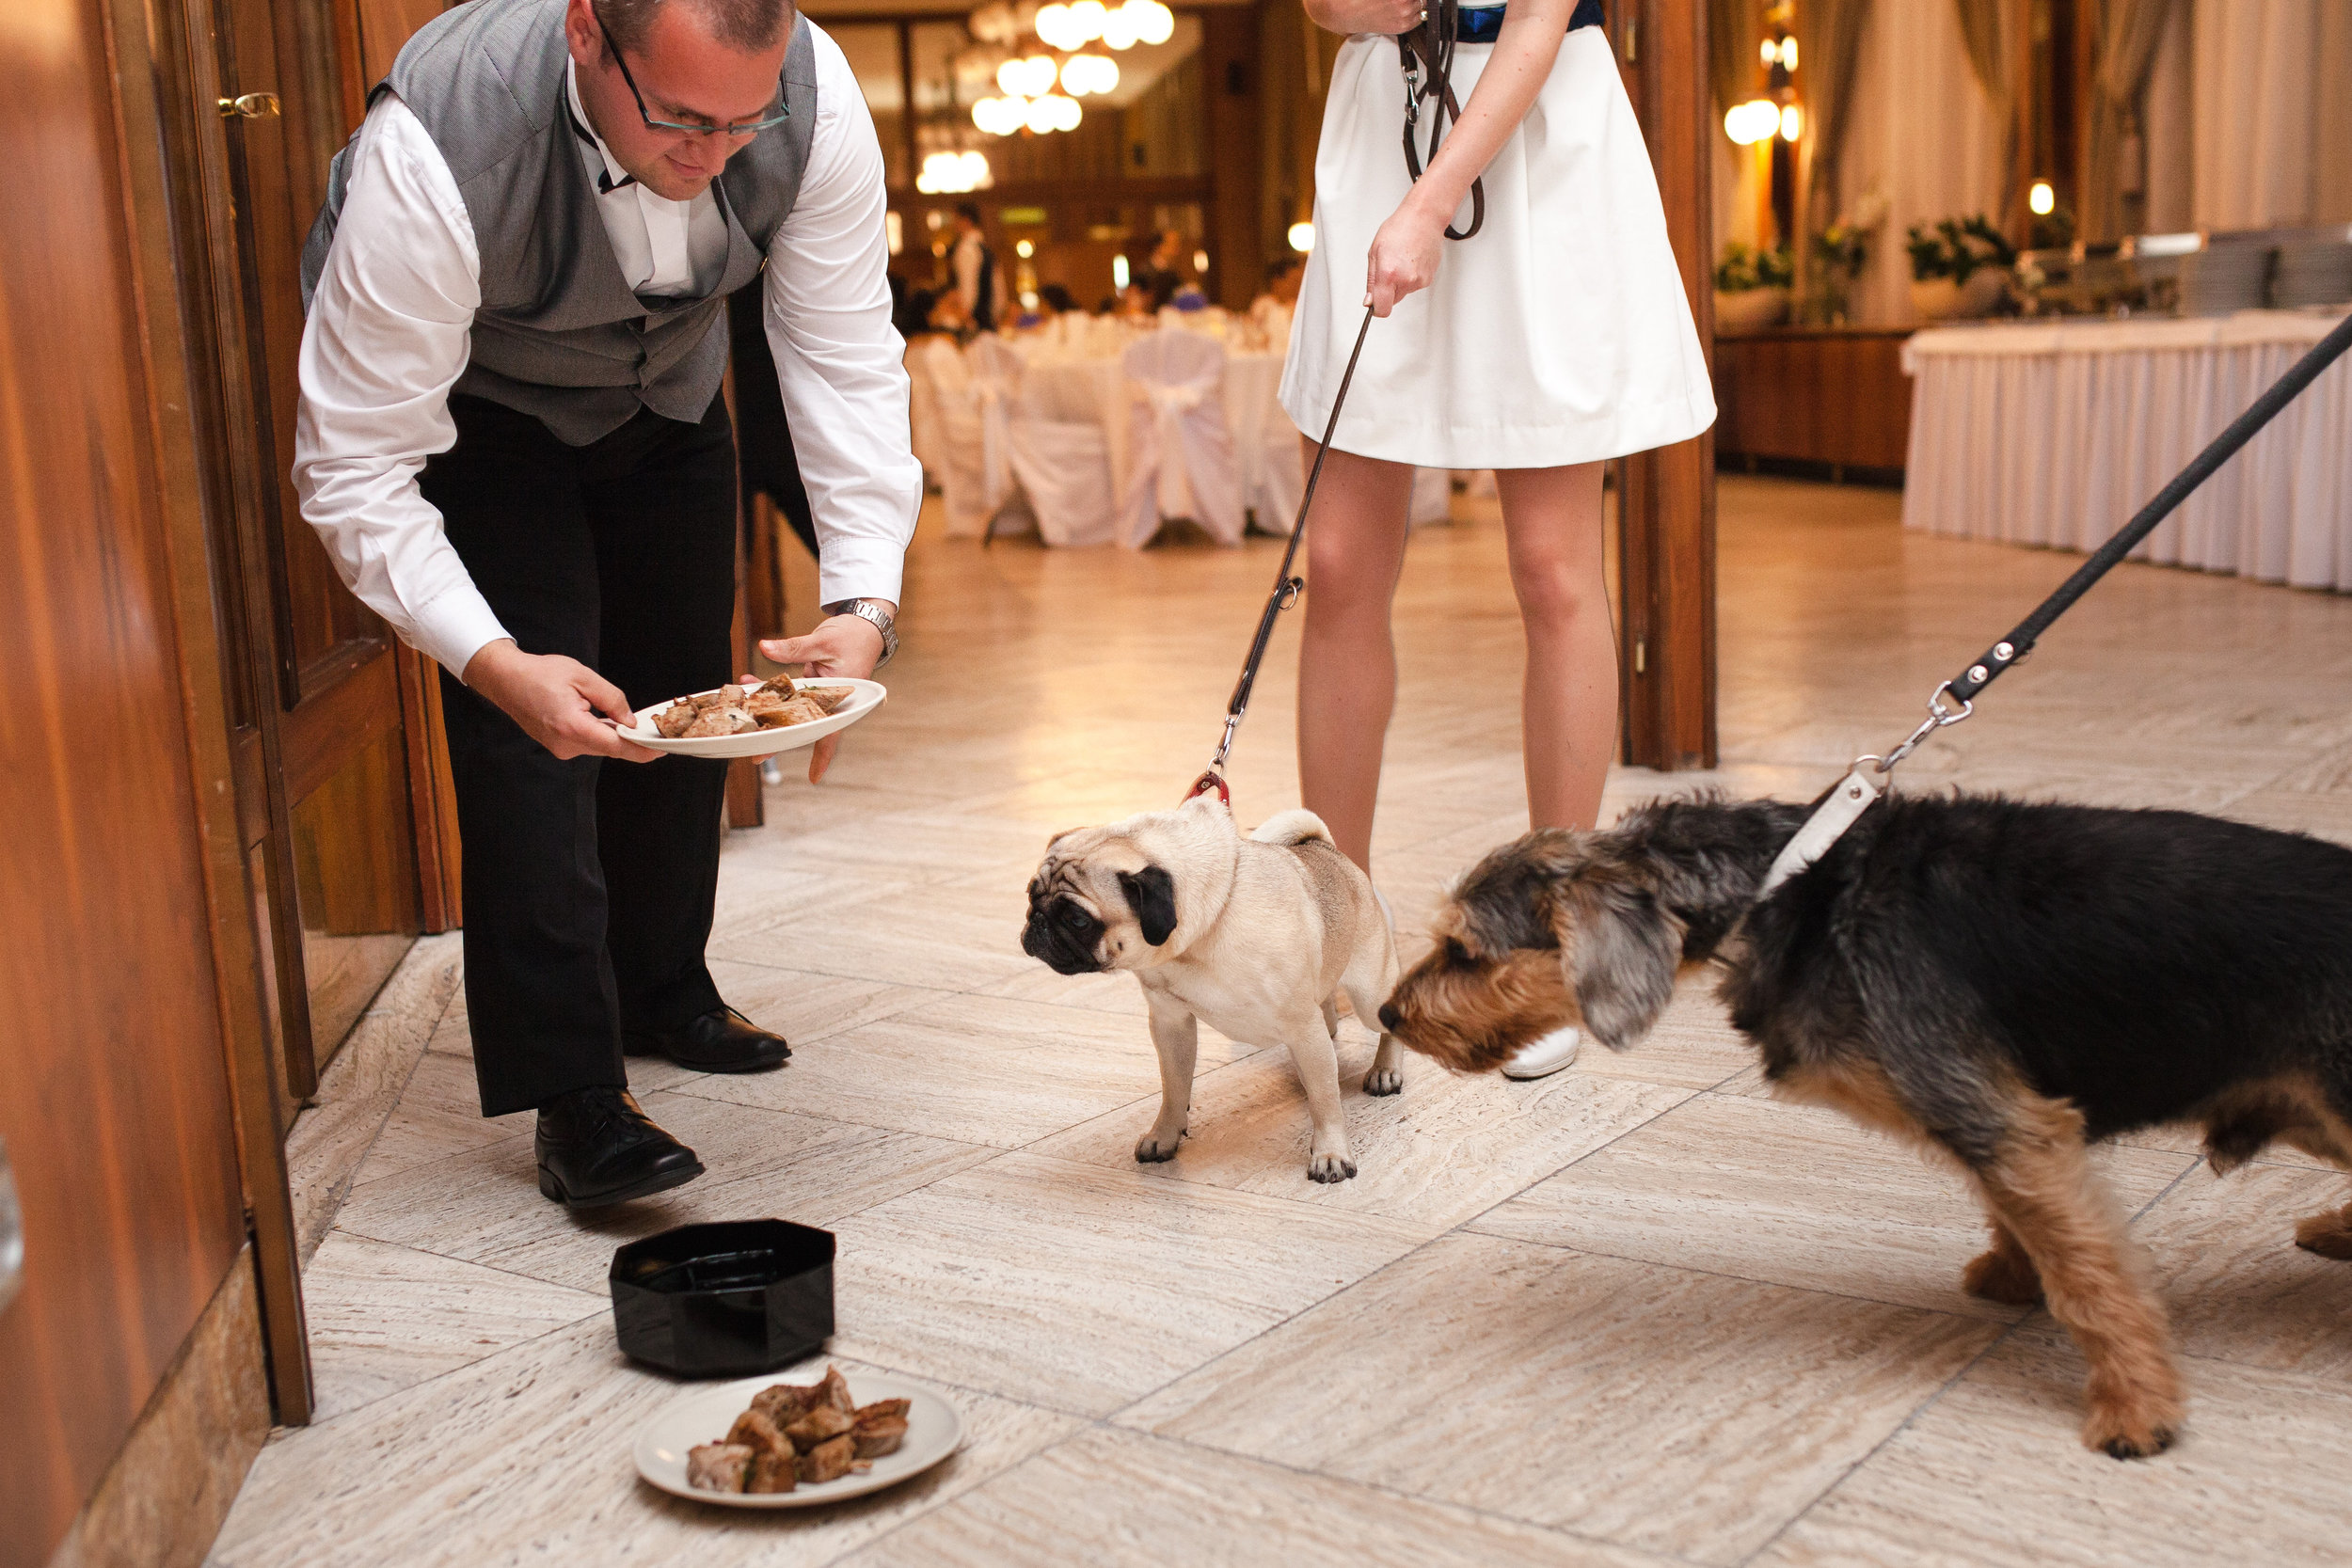 destination-wedding-photographer-slovakia-bratislava-reception-hotel-devin-dogs-eating.jpg